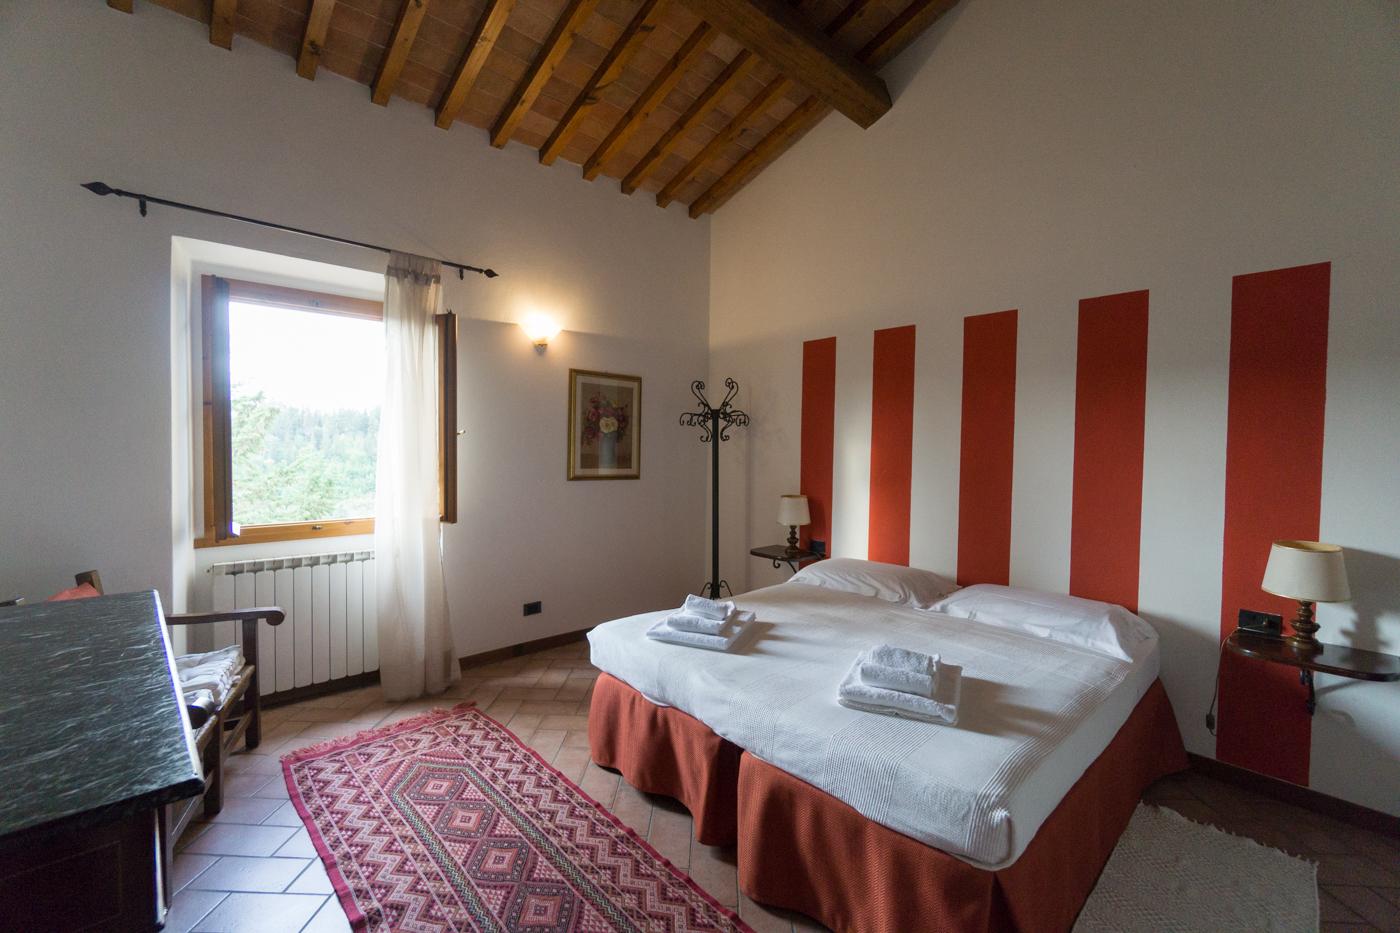 Casalta di Sotto avec KM Zero Tours à San Casciano Val di Pesa